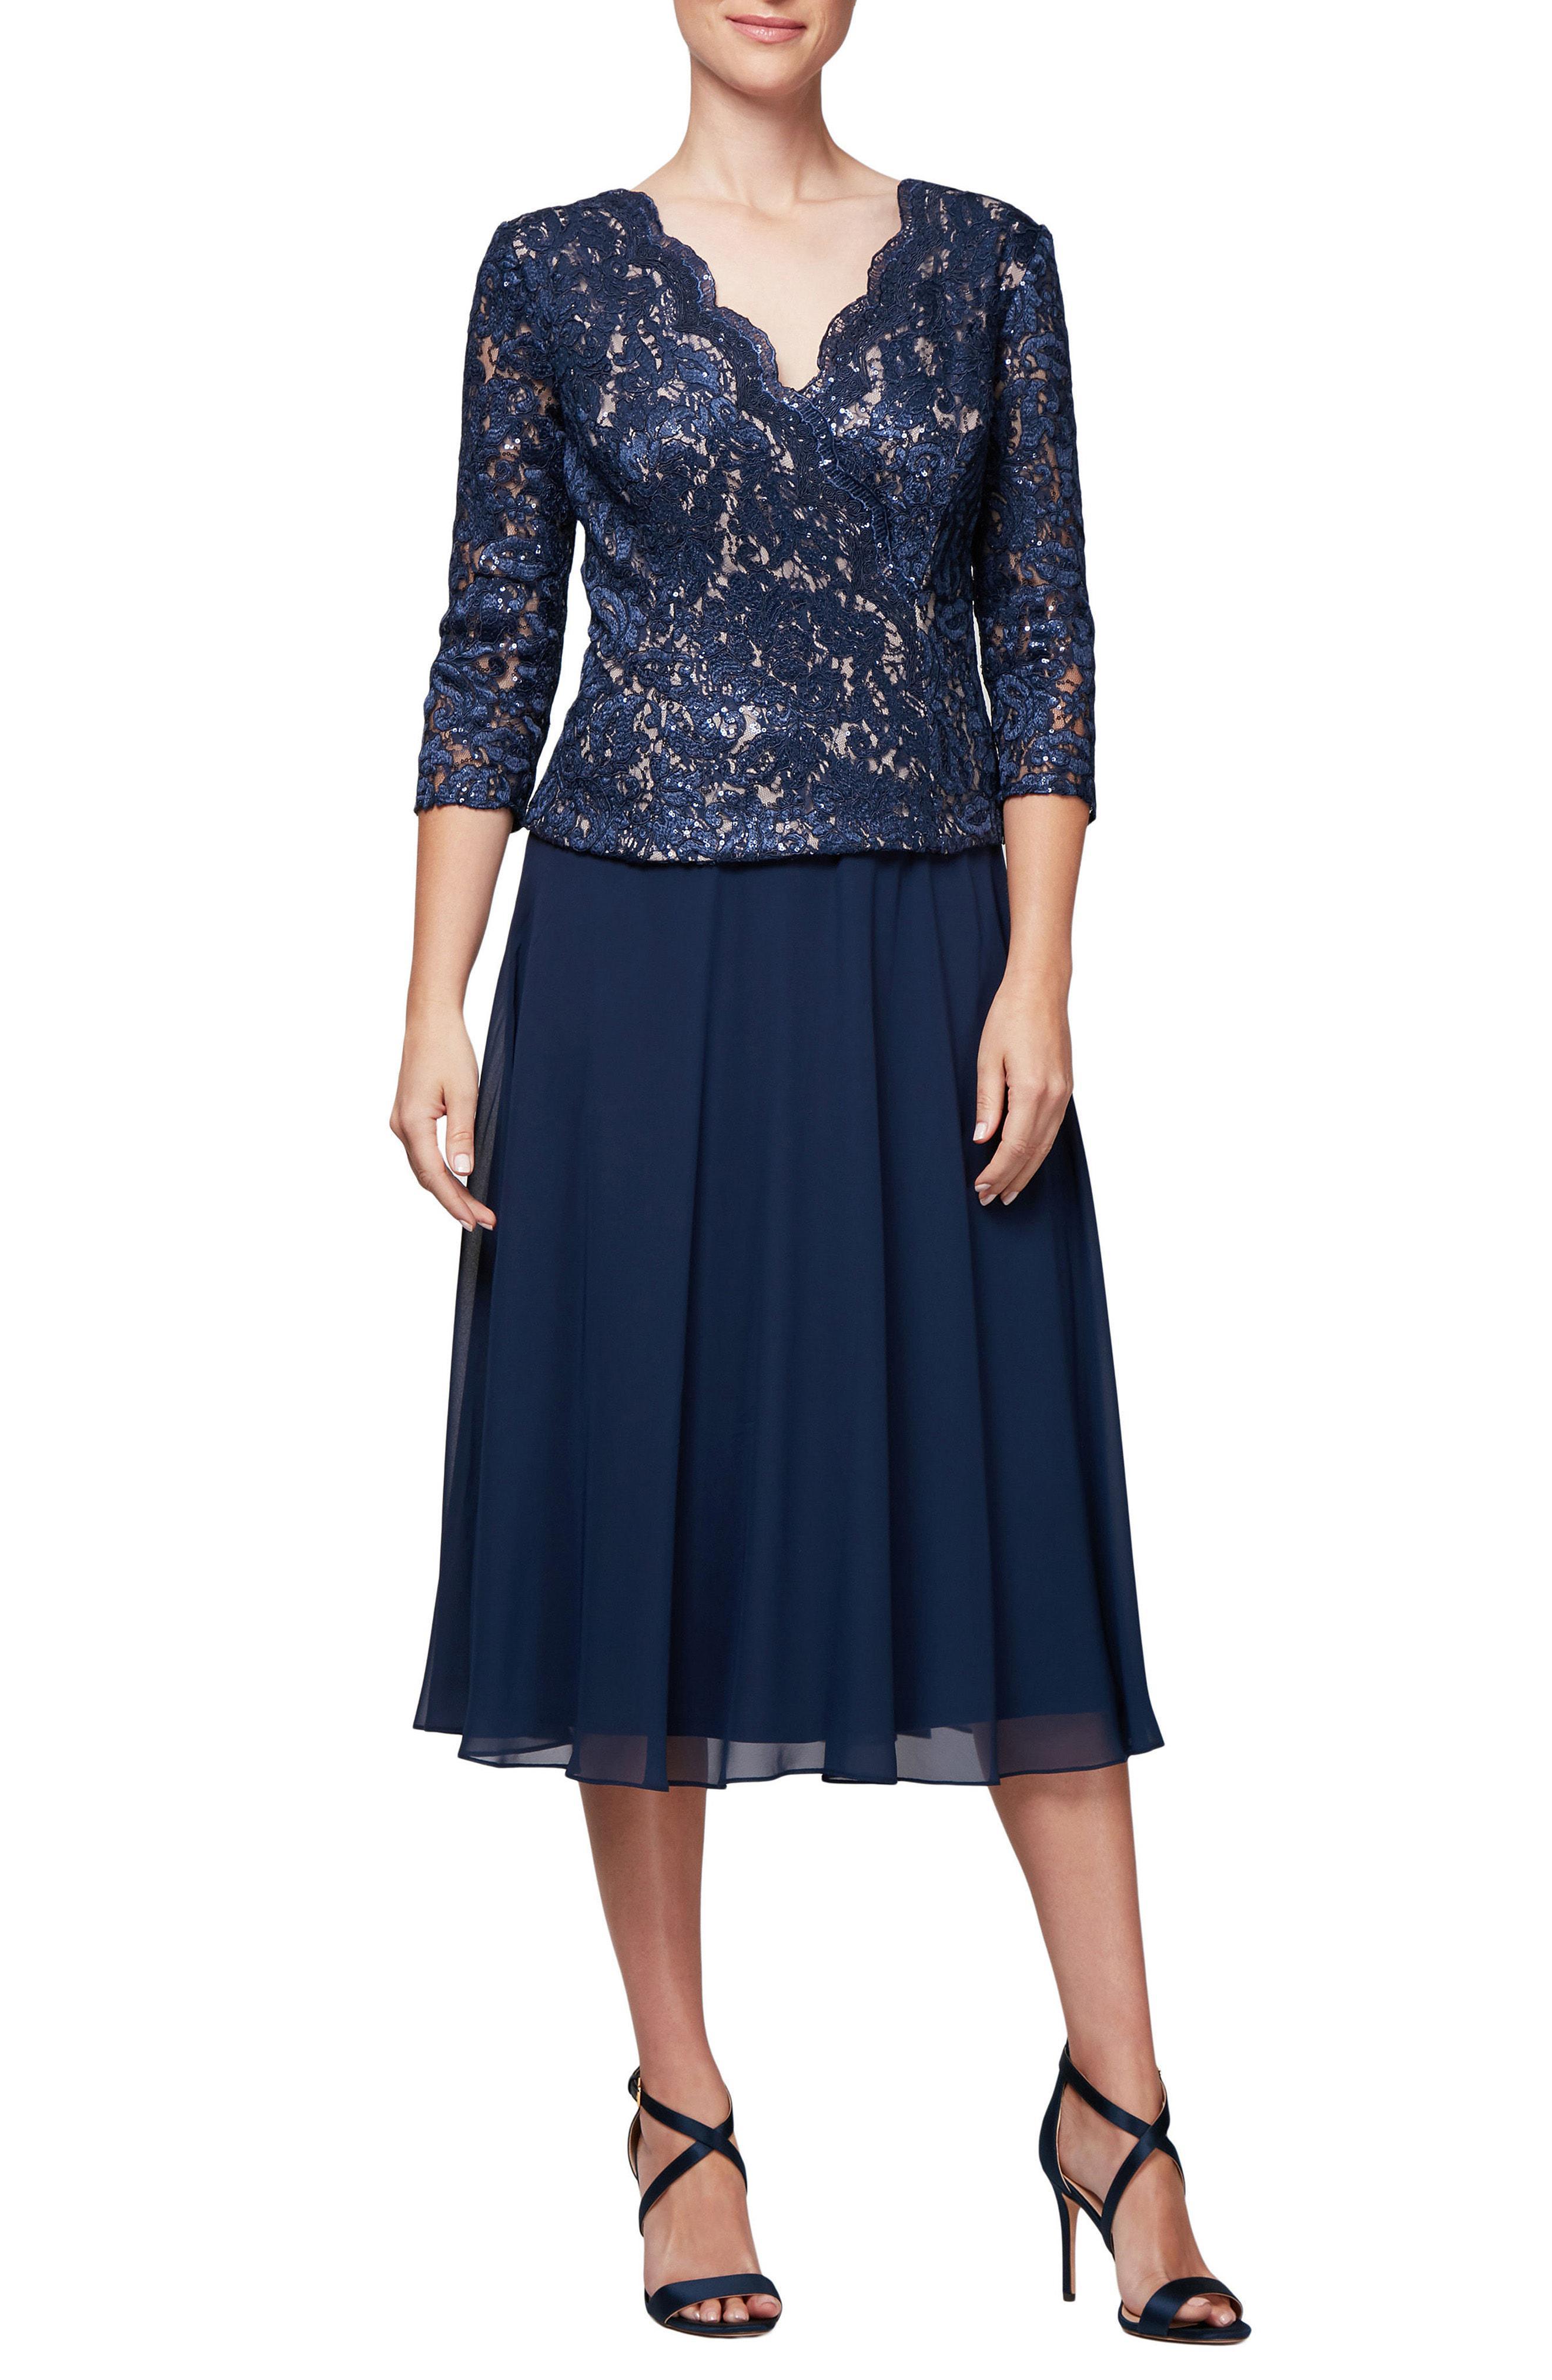 86a15d68476c9 Lyst - Alex Evenings Lace   Chiffon Tea Length Dress in Blue